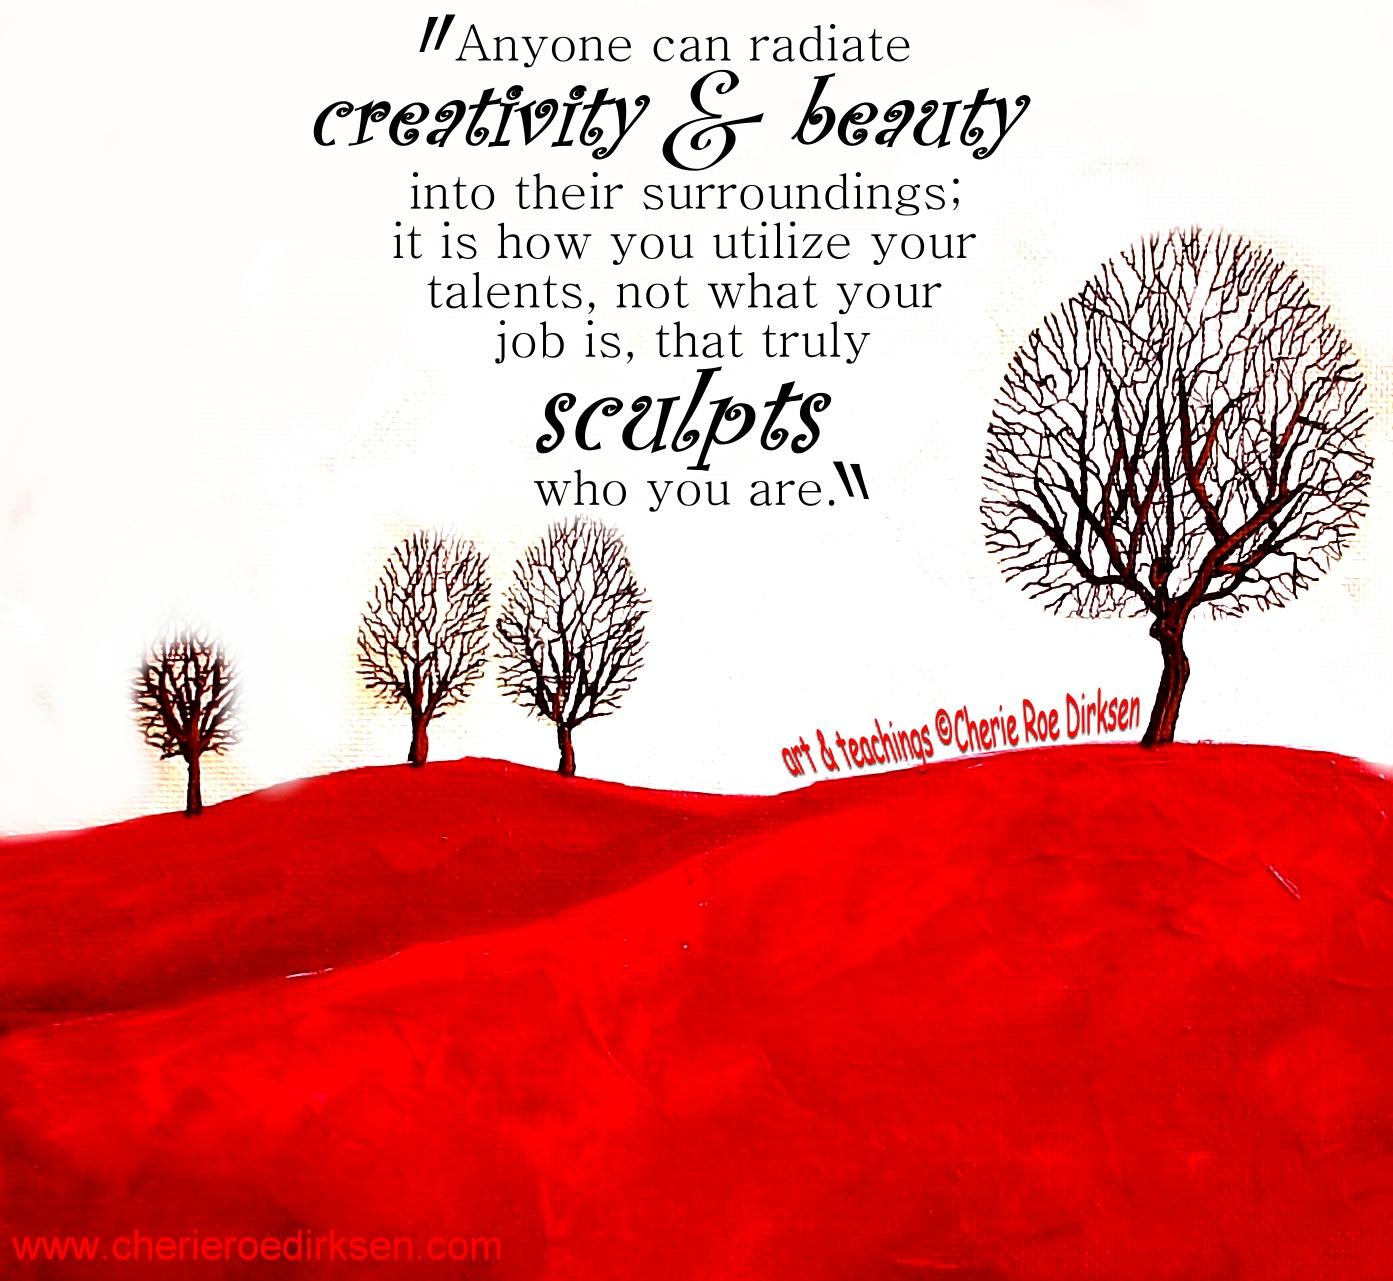 Creativity Quote 2 by Cherie Roe Dirksen